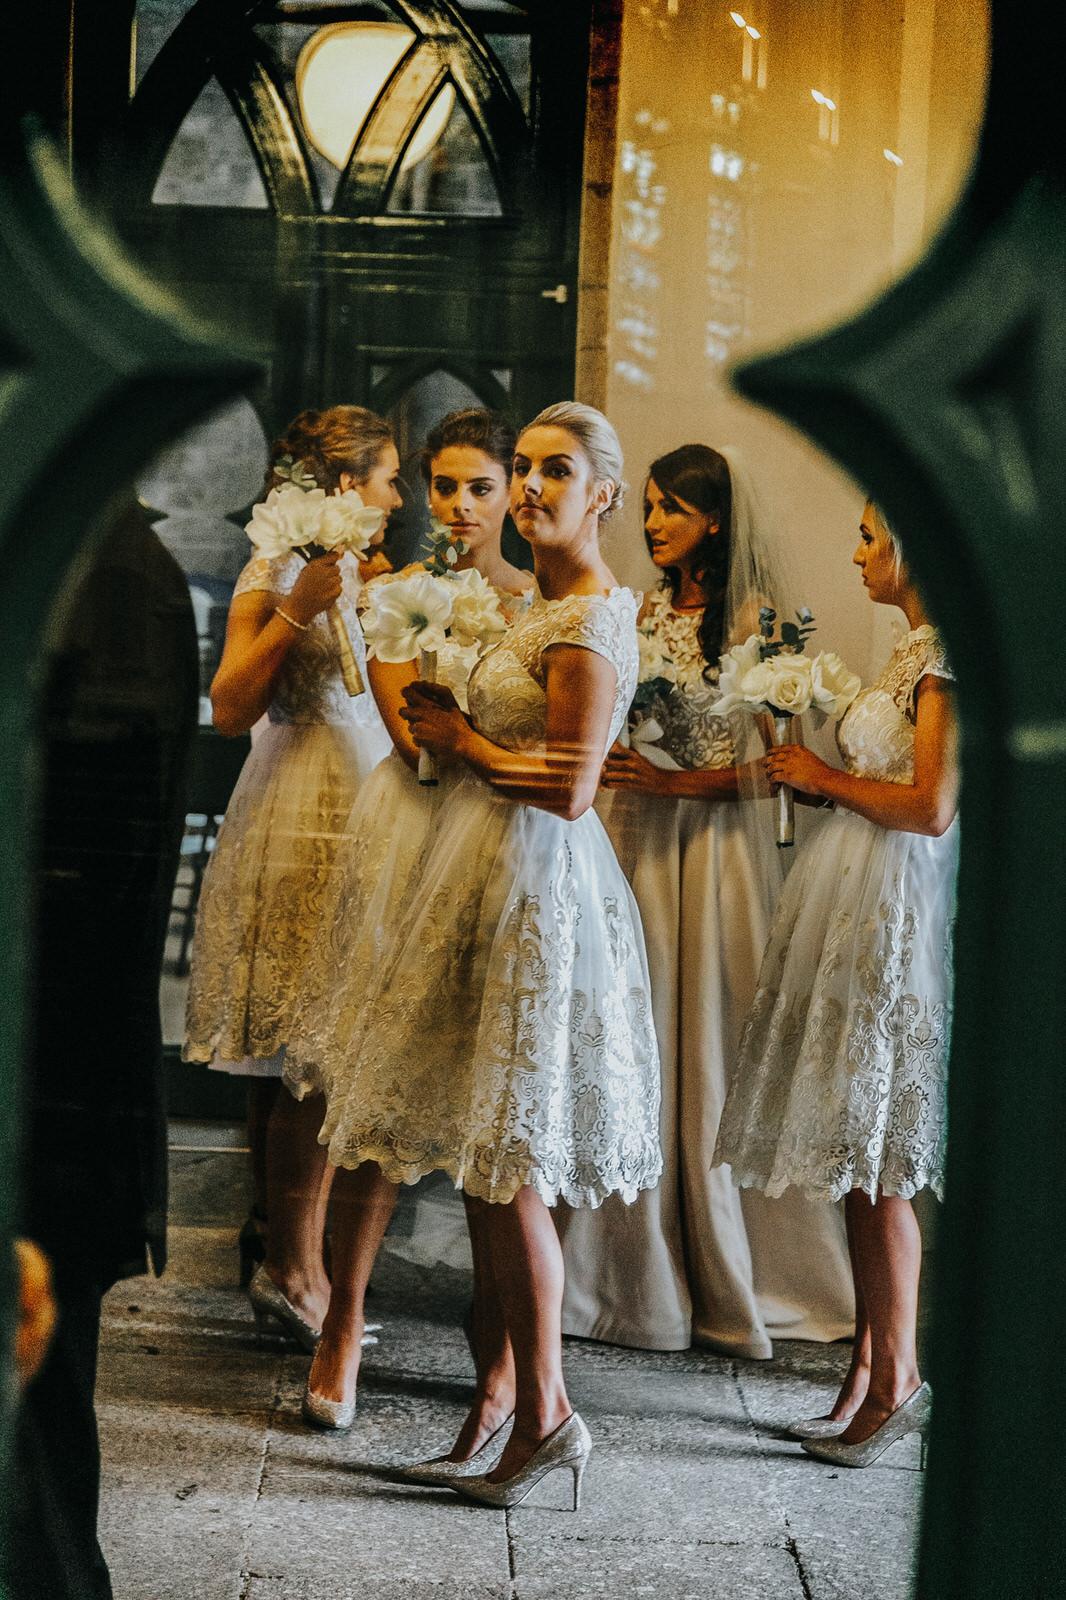 Roger_Kenny_wedding_photographer_427.jpg